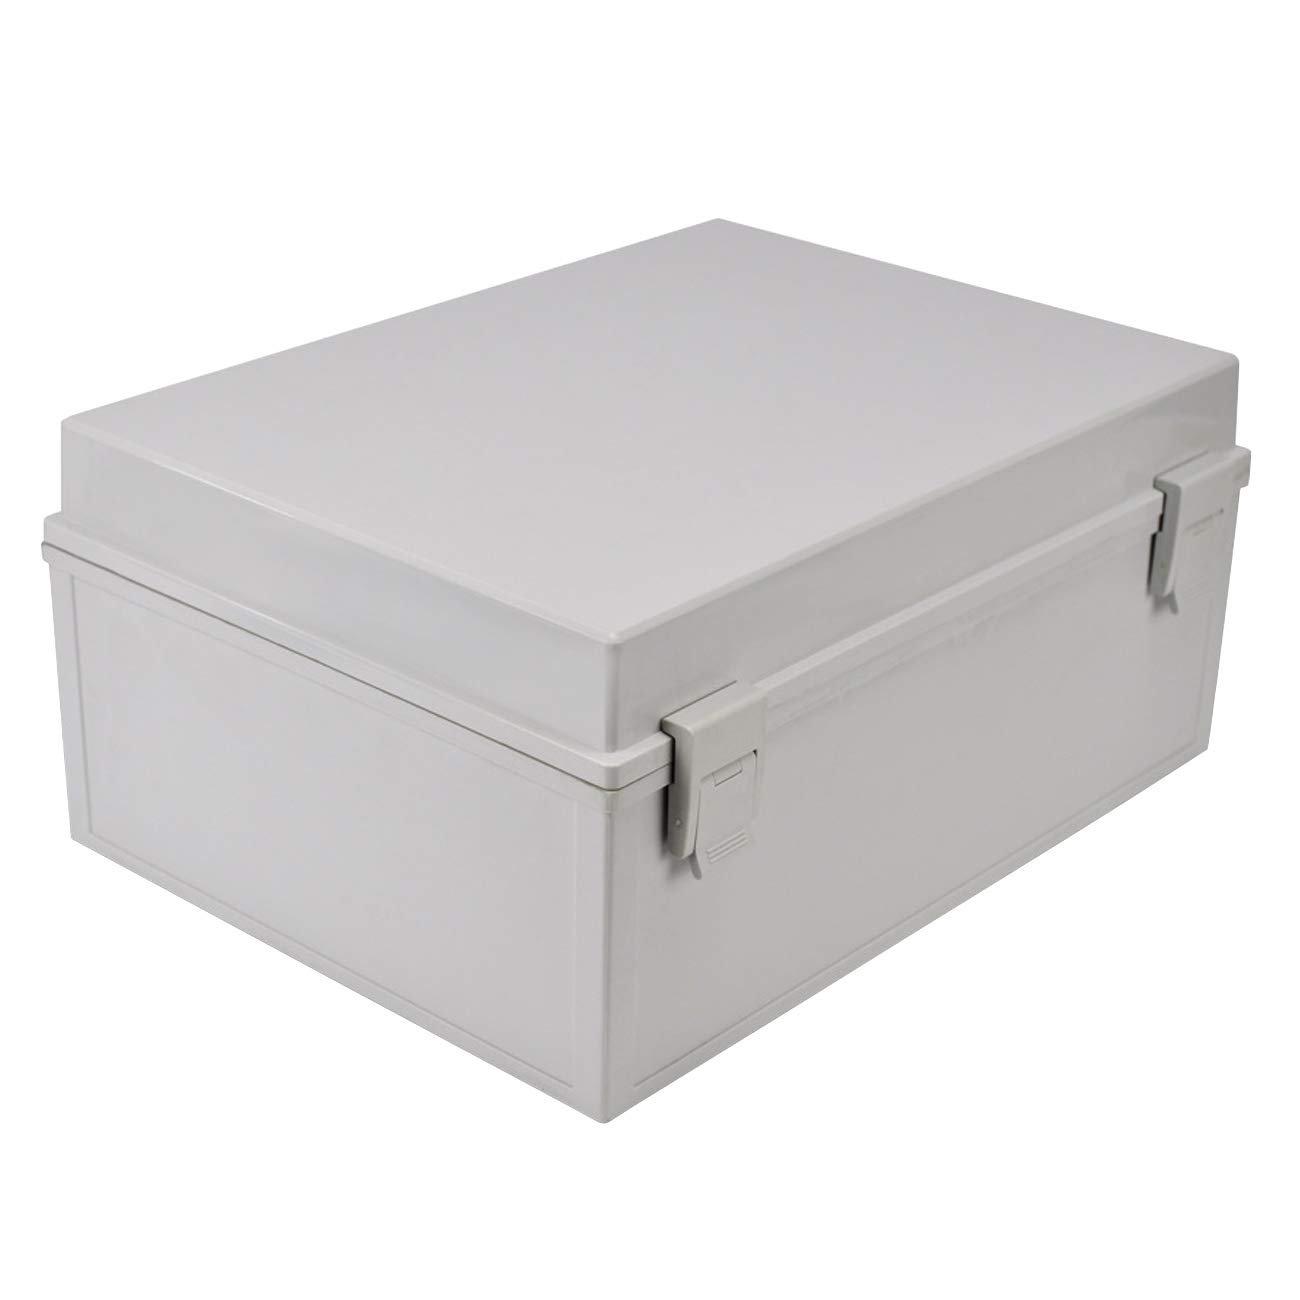 https://www.kdmsteel.com/wp-content/uploads/2020/02/b-ABS-Plastic-Dustproof-Waterproof-Junction-Box.jpg